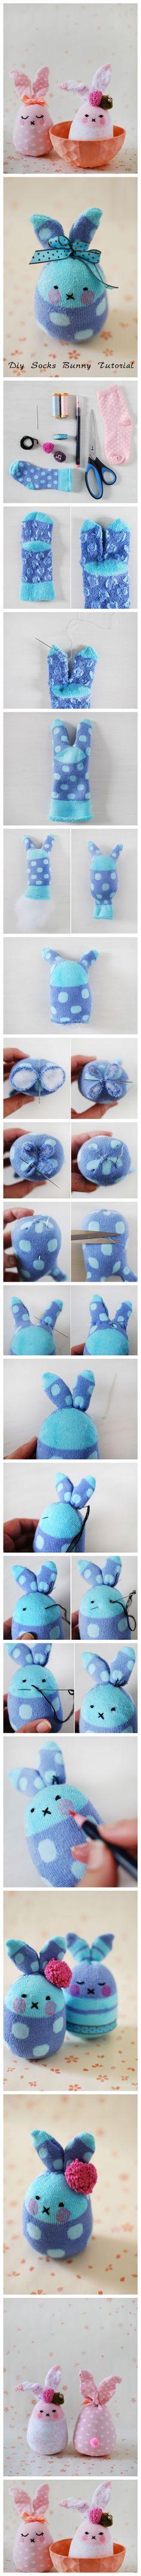 Diy Socks Bunny Tutorial